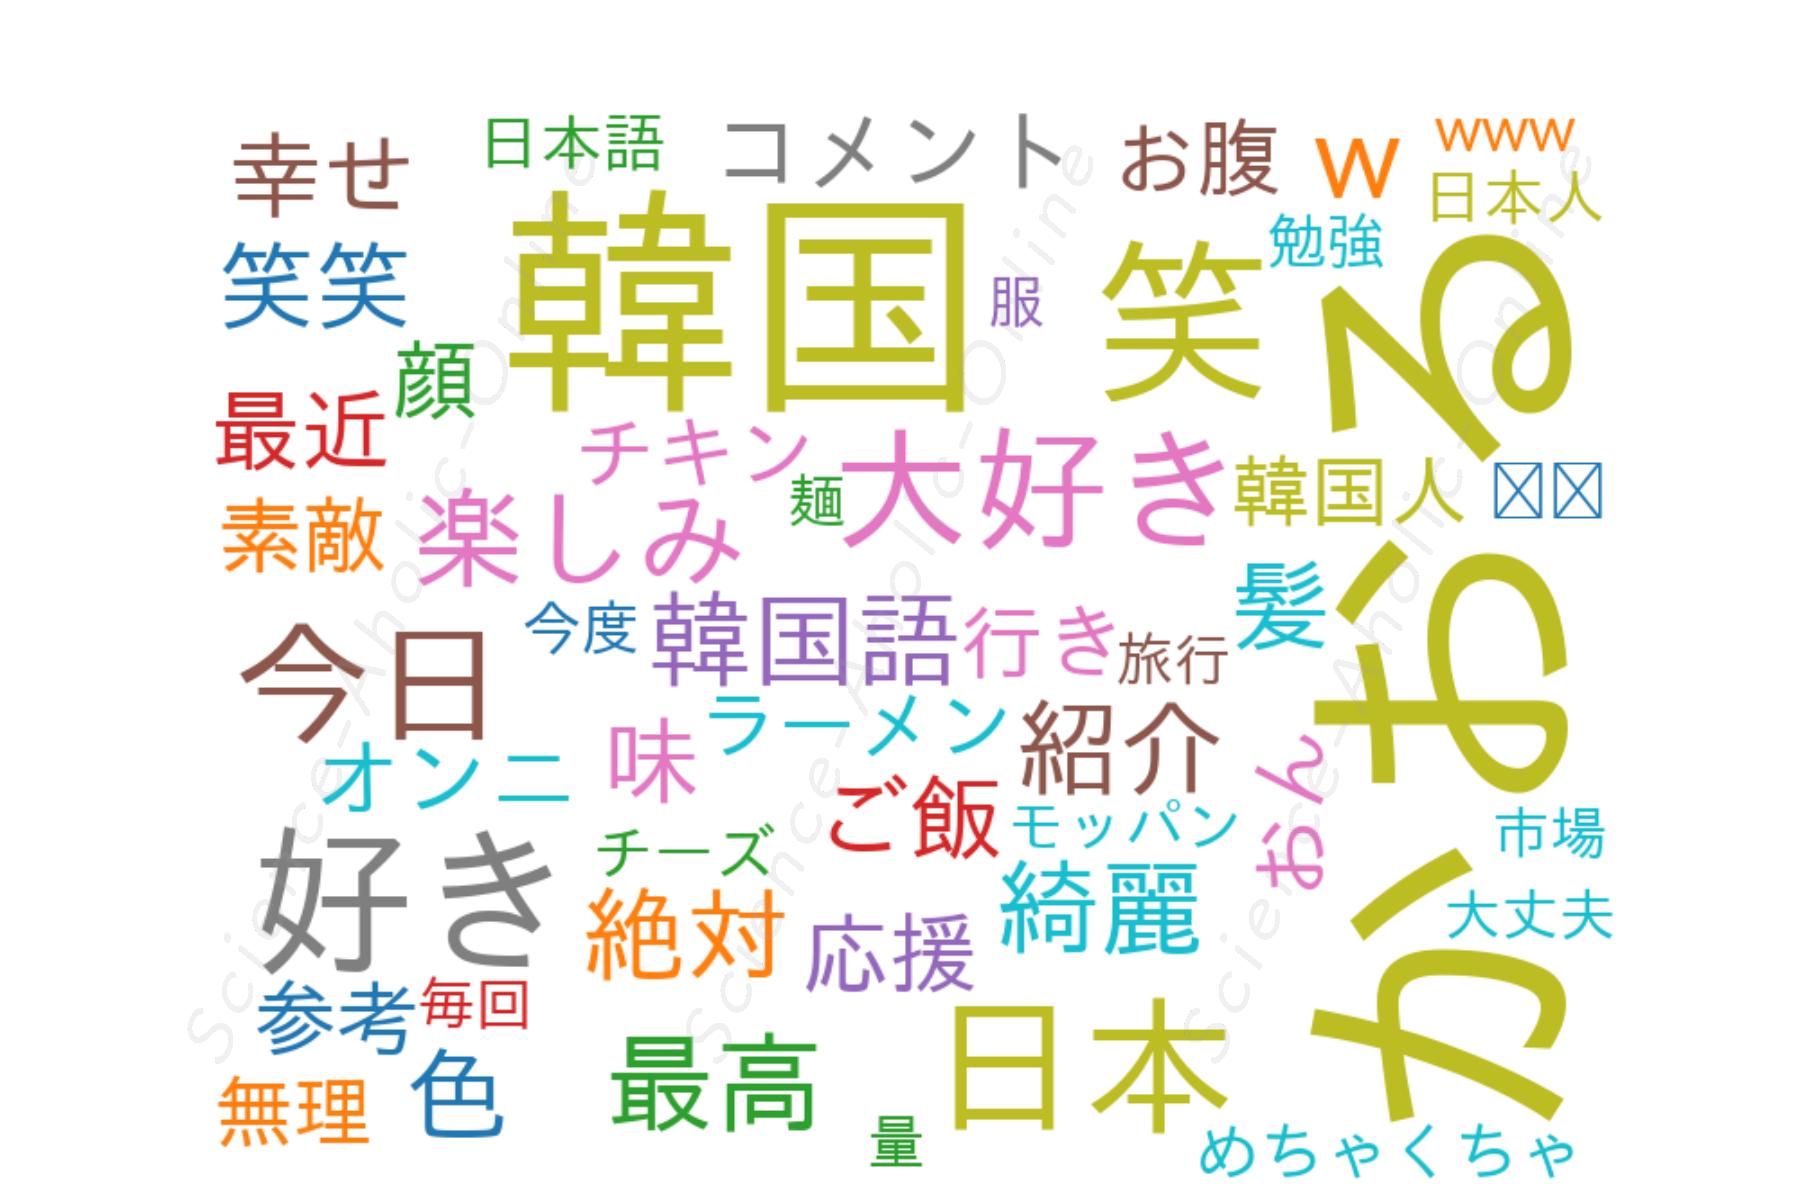 https://science-aholic-online.com/wp-content/uploads/2020/08/wordcloud_KaoruTV.png